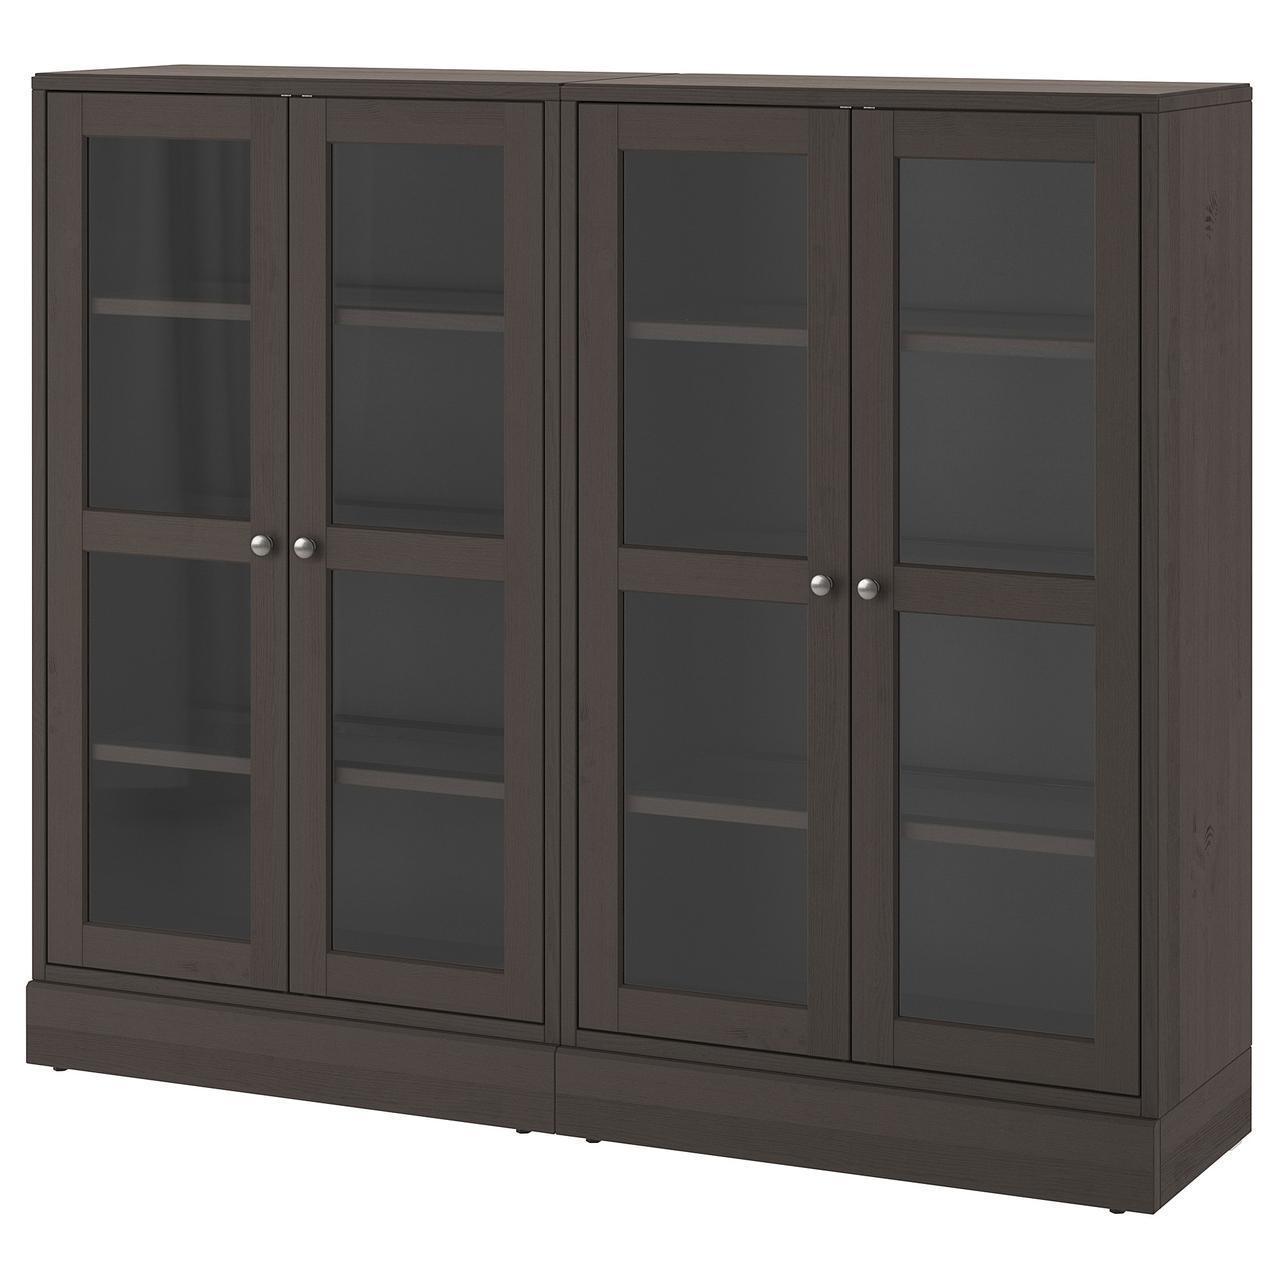 Сервант IKEA HAVSTA 162x134x37 см темно-коричневый 792.659.50